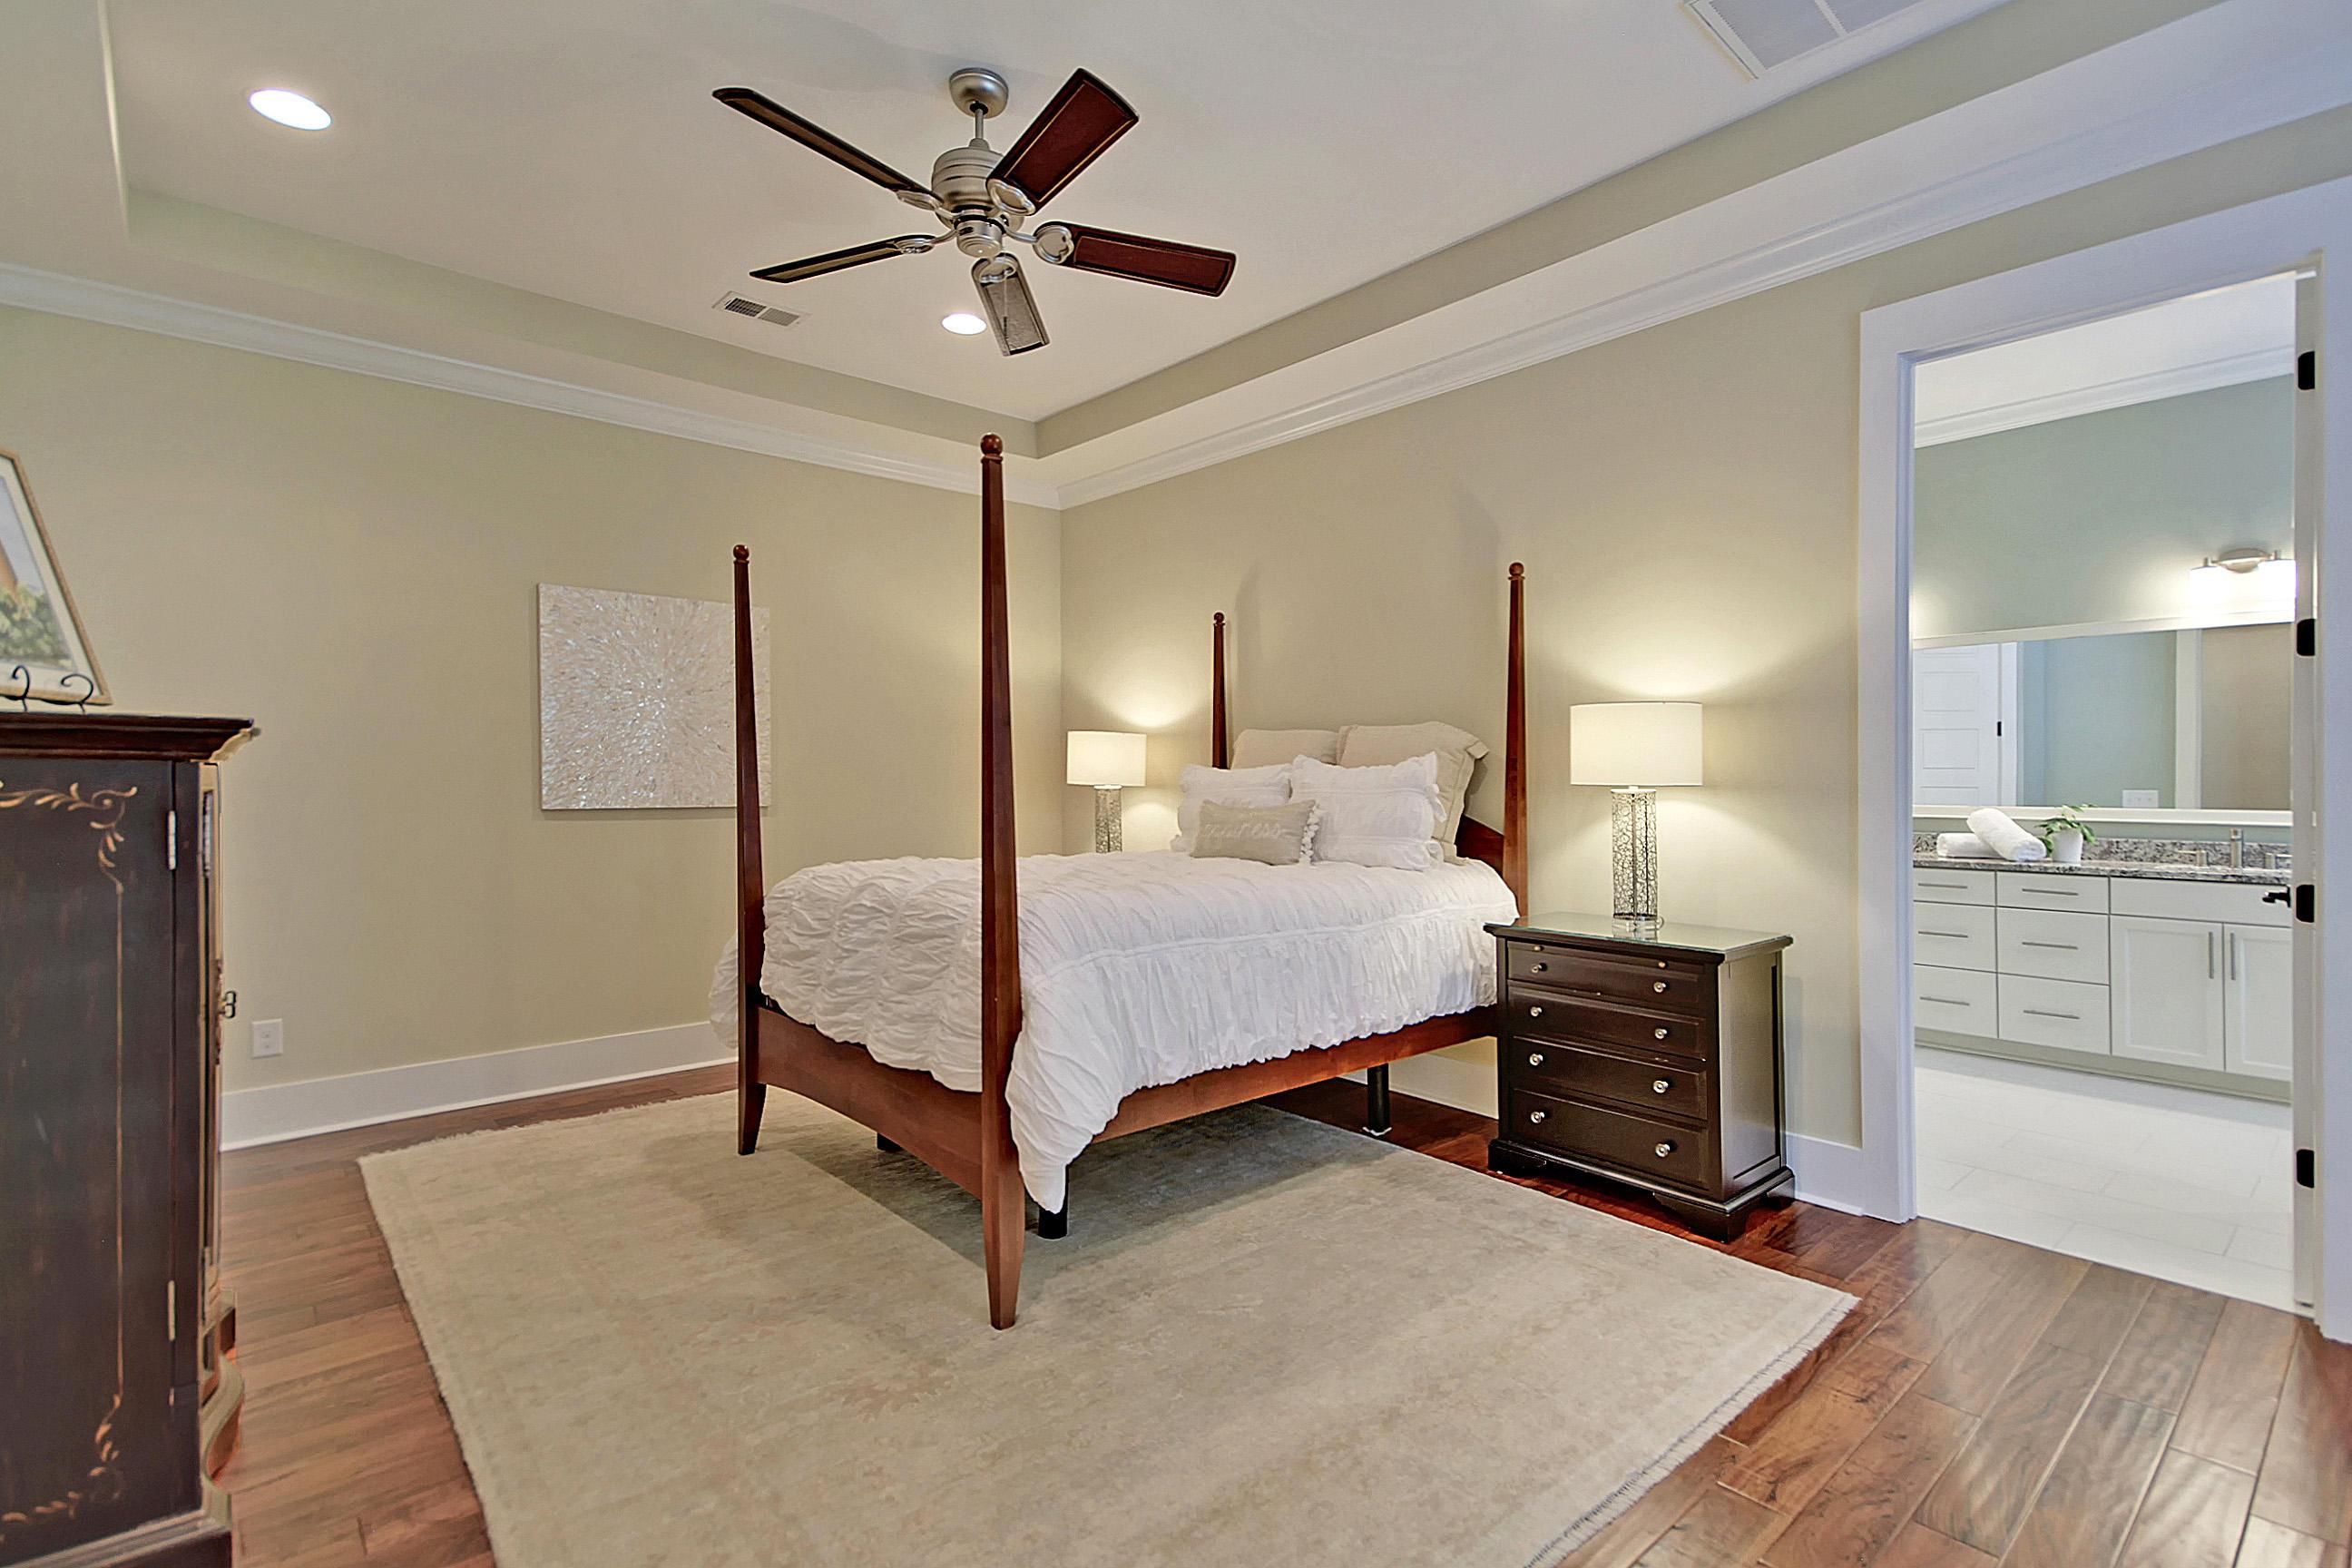 Riverland Terrace Homes For Sale - 2153 Fort Pemberton, Charleston, SC - 7